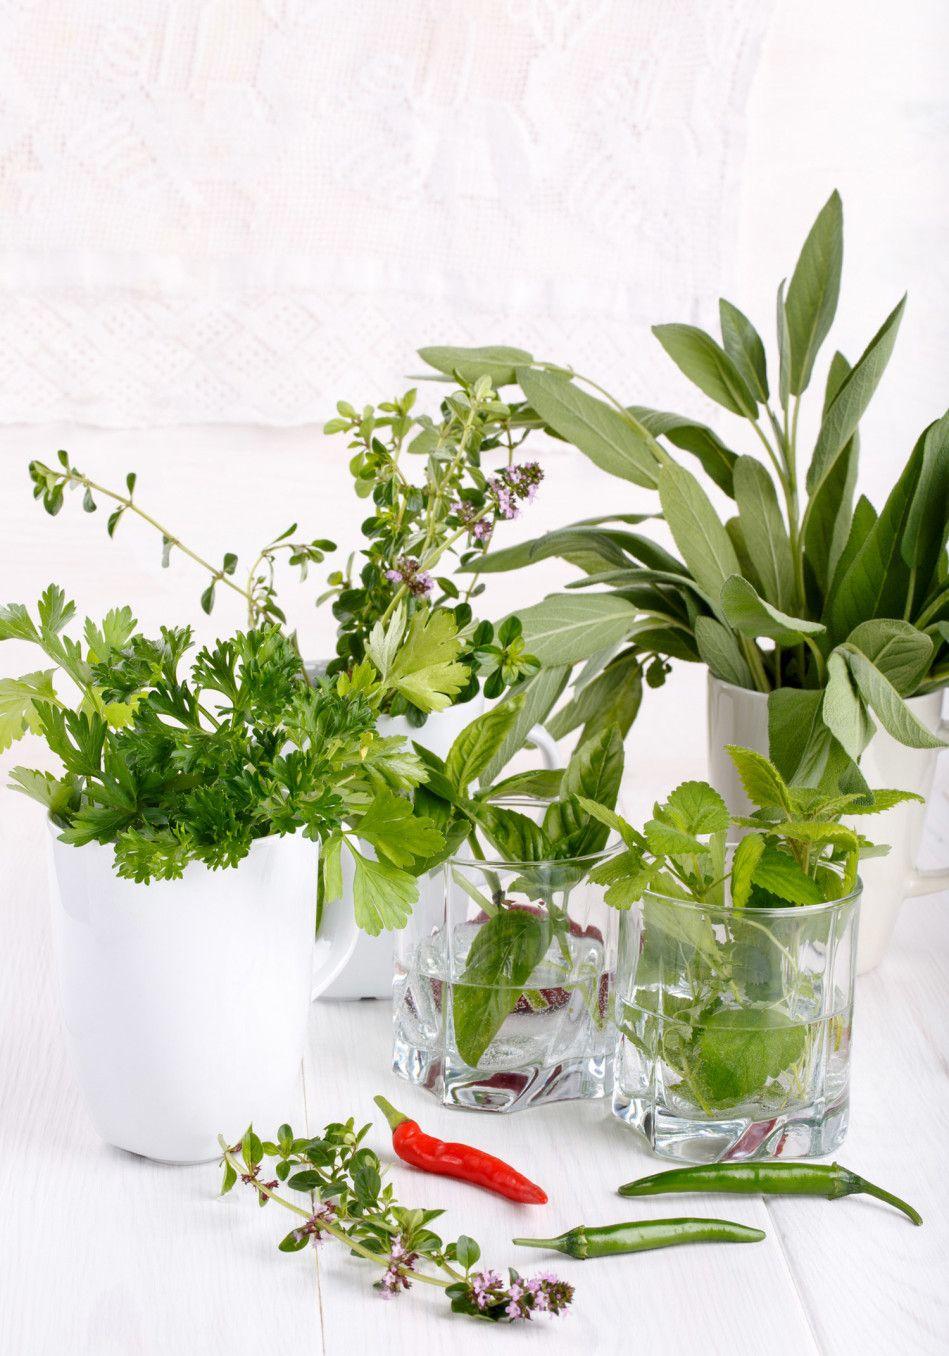 how do you store fresh cilantro in the fridge